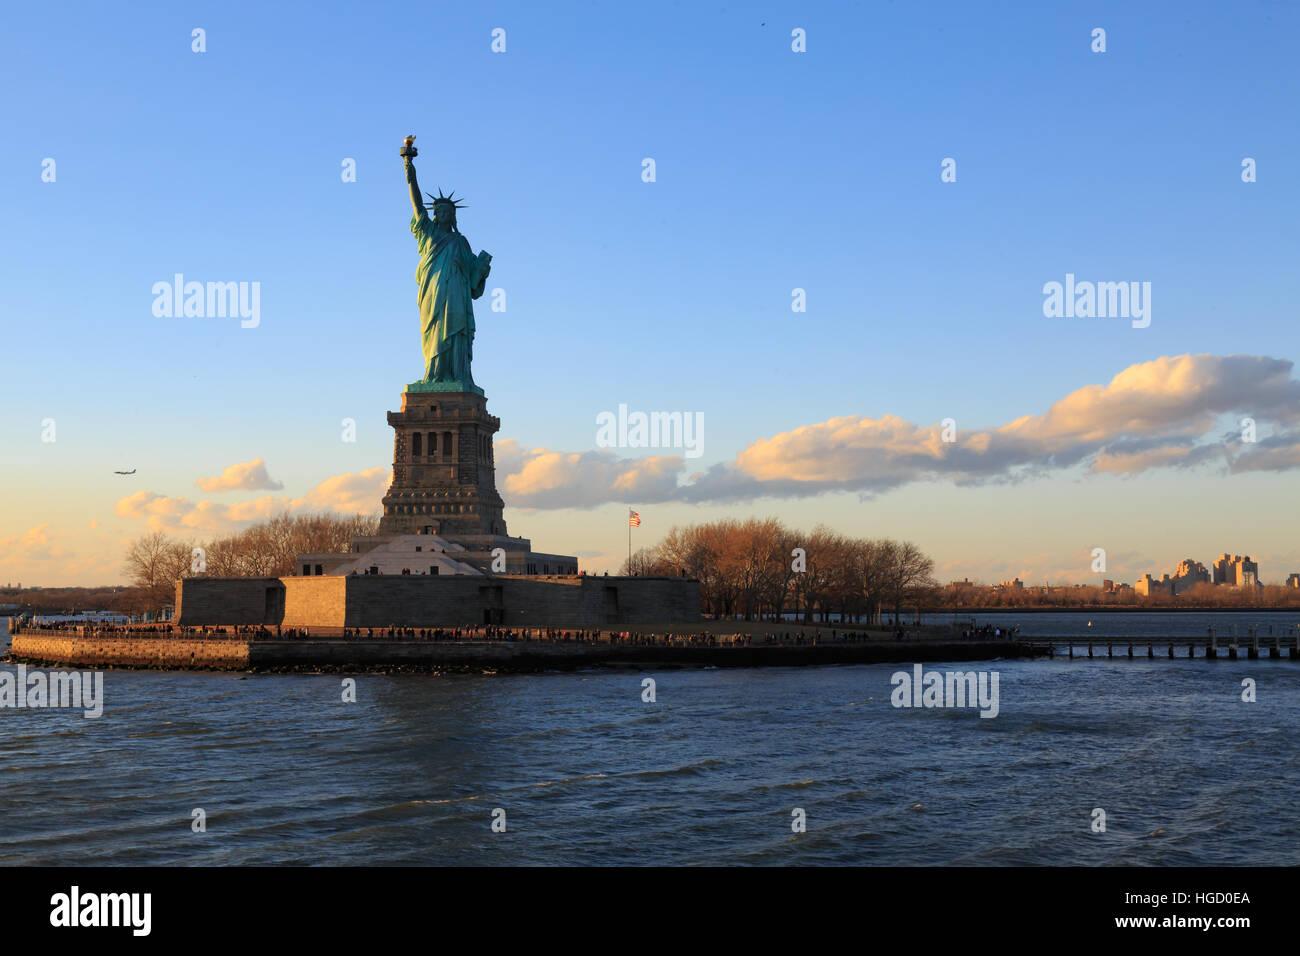 Statue von Liberty New York City. Stockbild